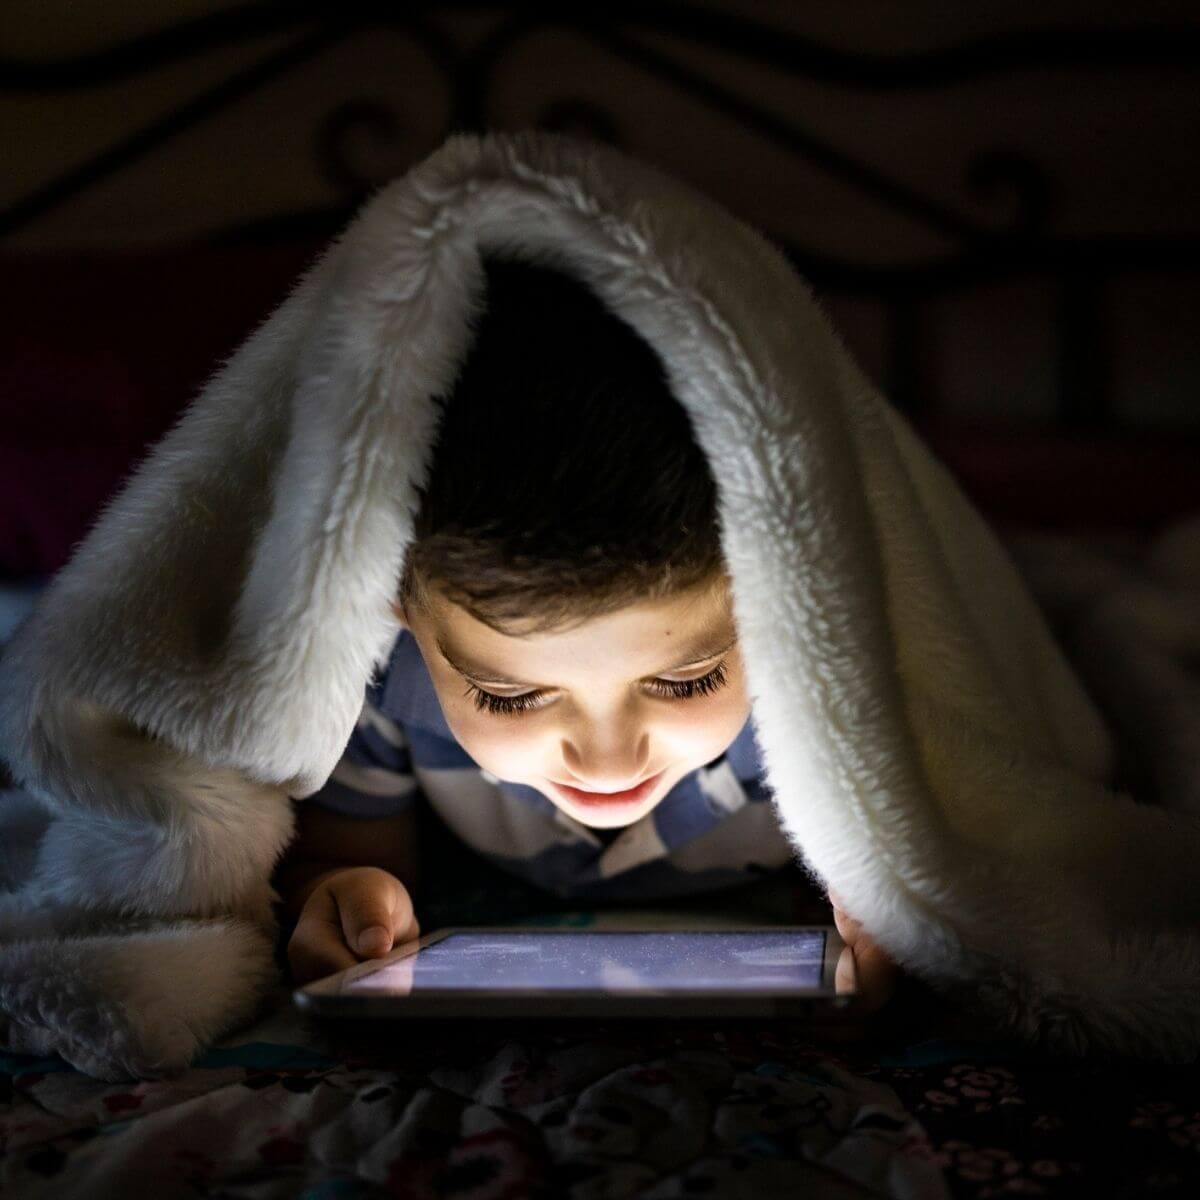 Little boy watches screen under cover header